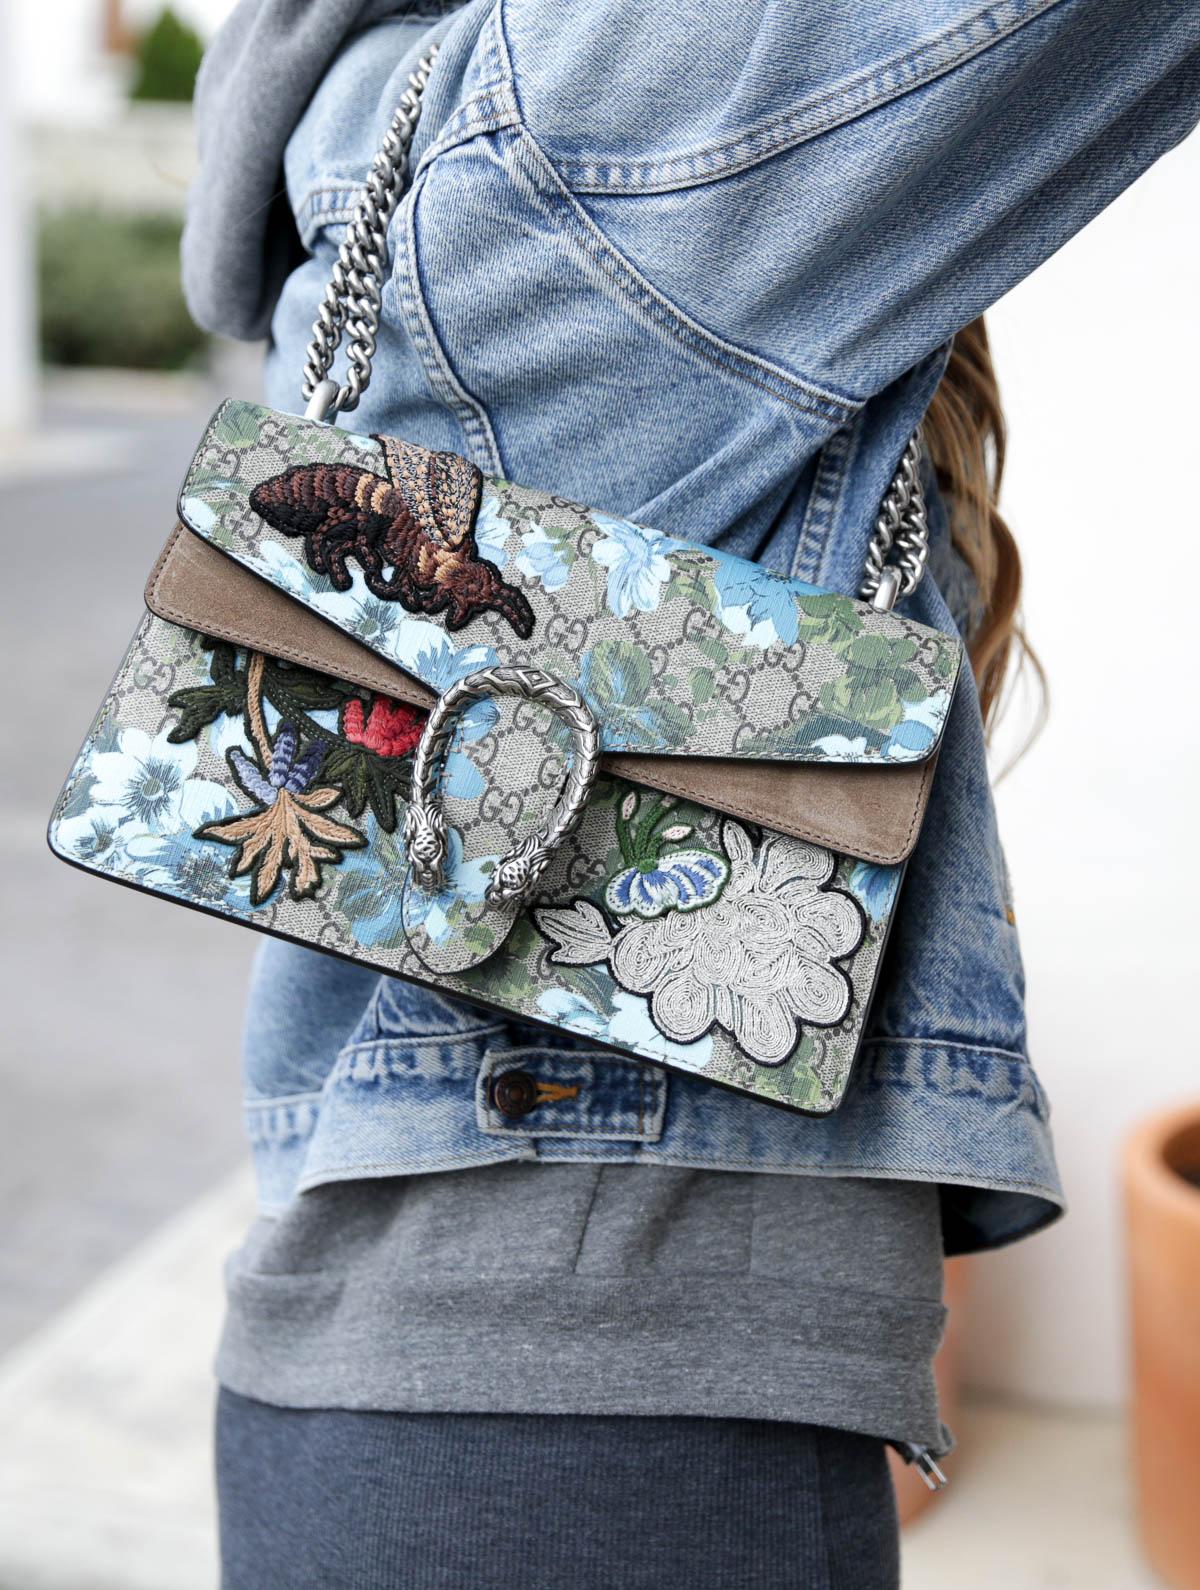 black-friday-a-bicyclette-sweatshirt-hoodie-all-star-leather-piel-cuero-celine-bag-bolso-mini-skirt-falda-streetstyle-look-bartabac-outfit-moda-blogger-11